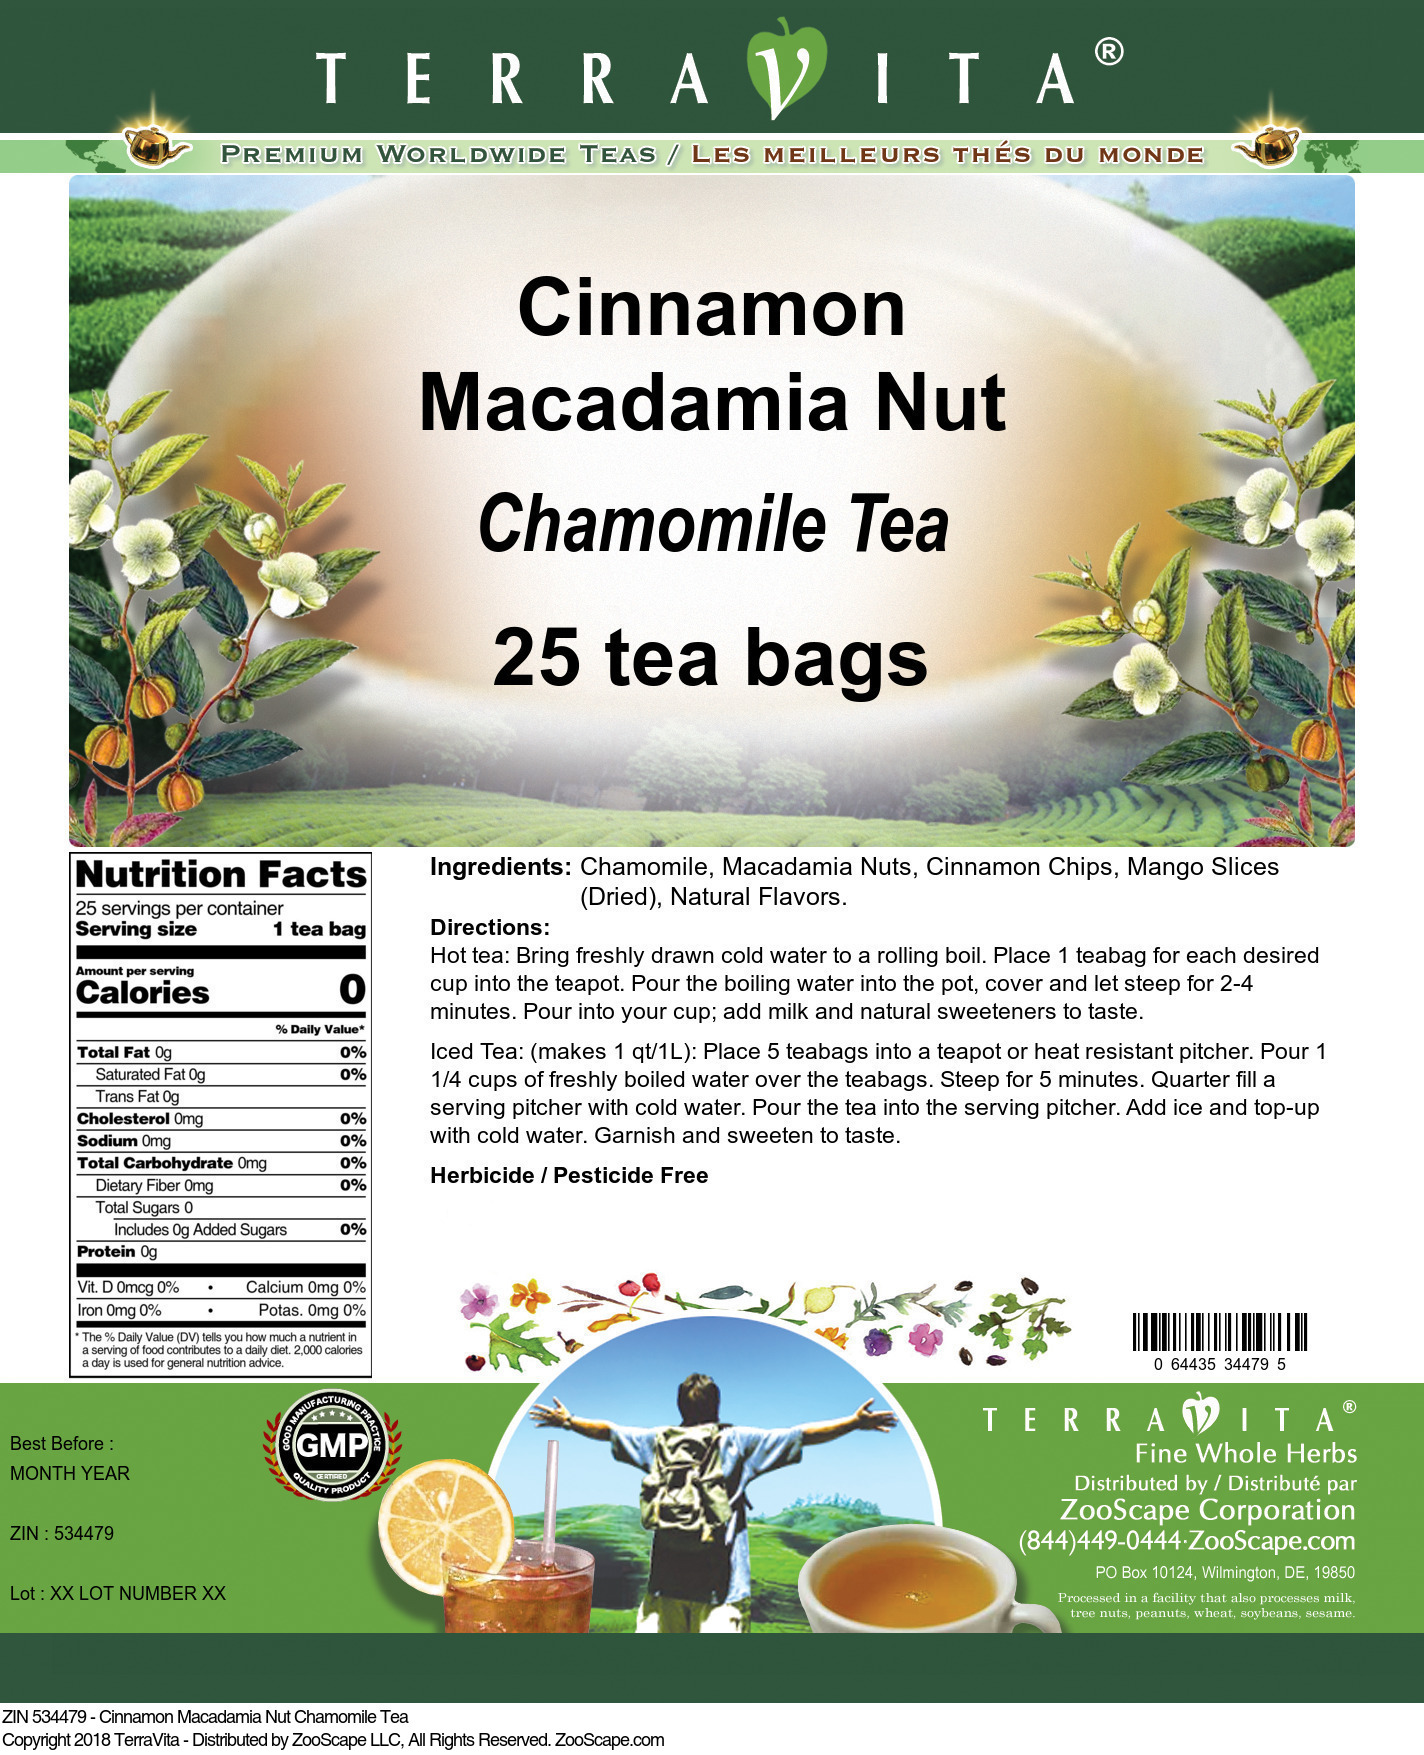 Cinnamon Macadamia Nut Chamomile Tea